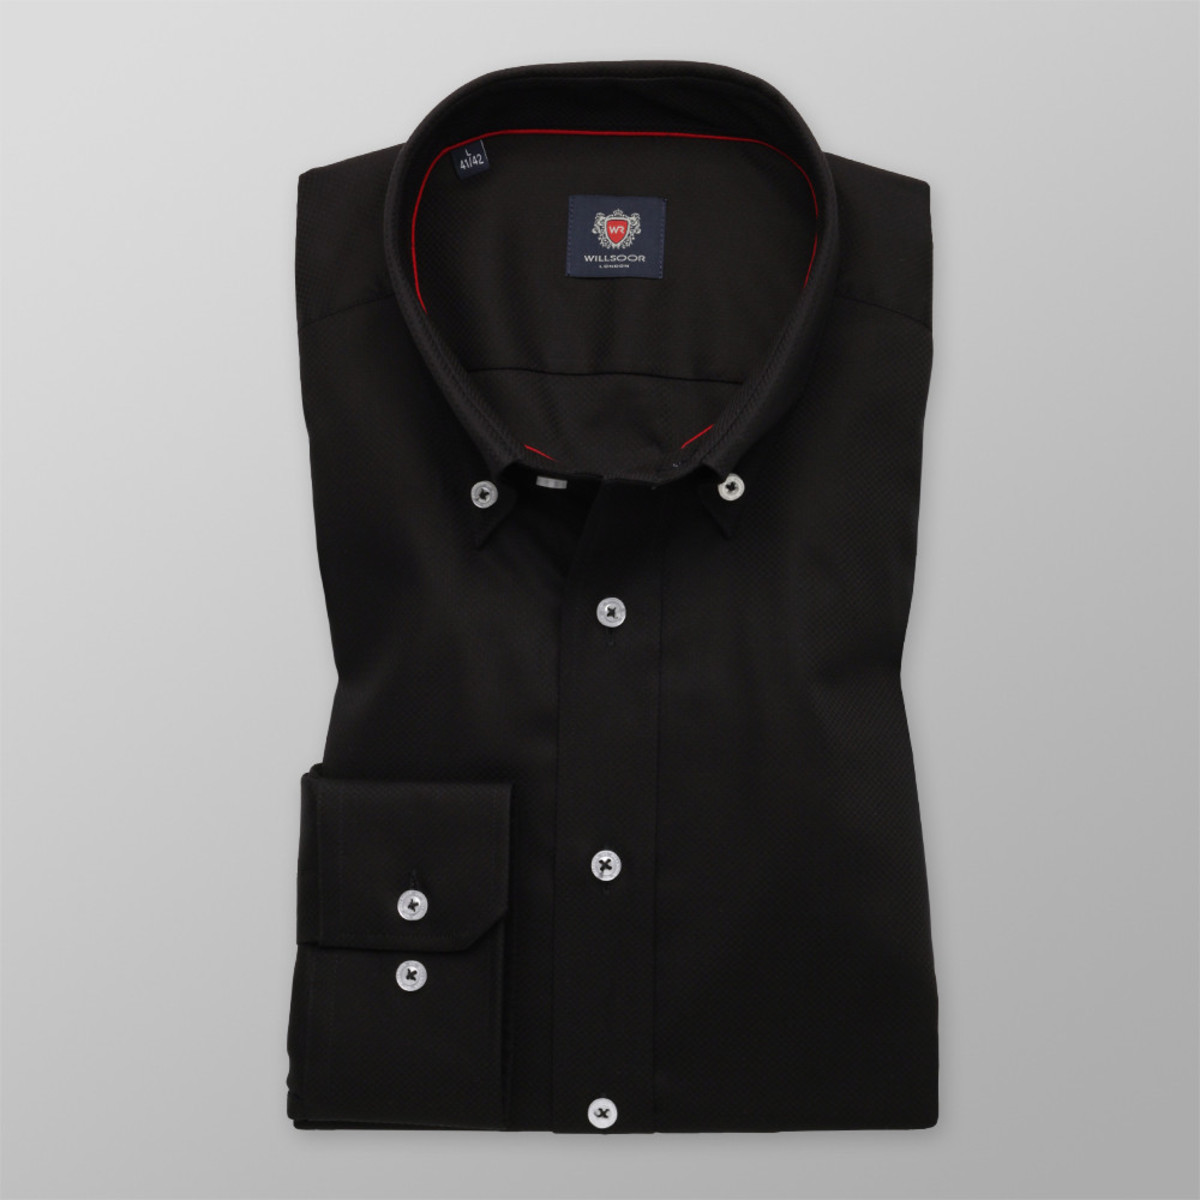 Košeľa London čierna (výška 176 - 182) 9882 176-182 / L (41/42)